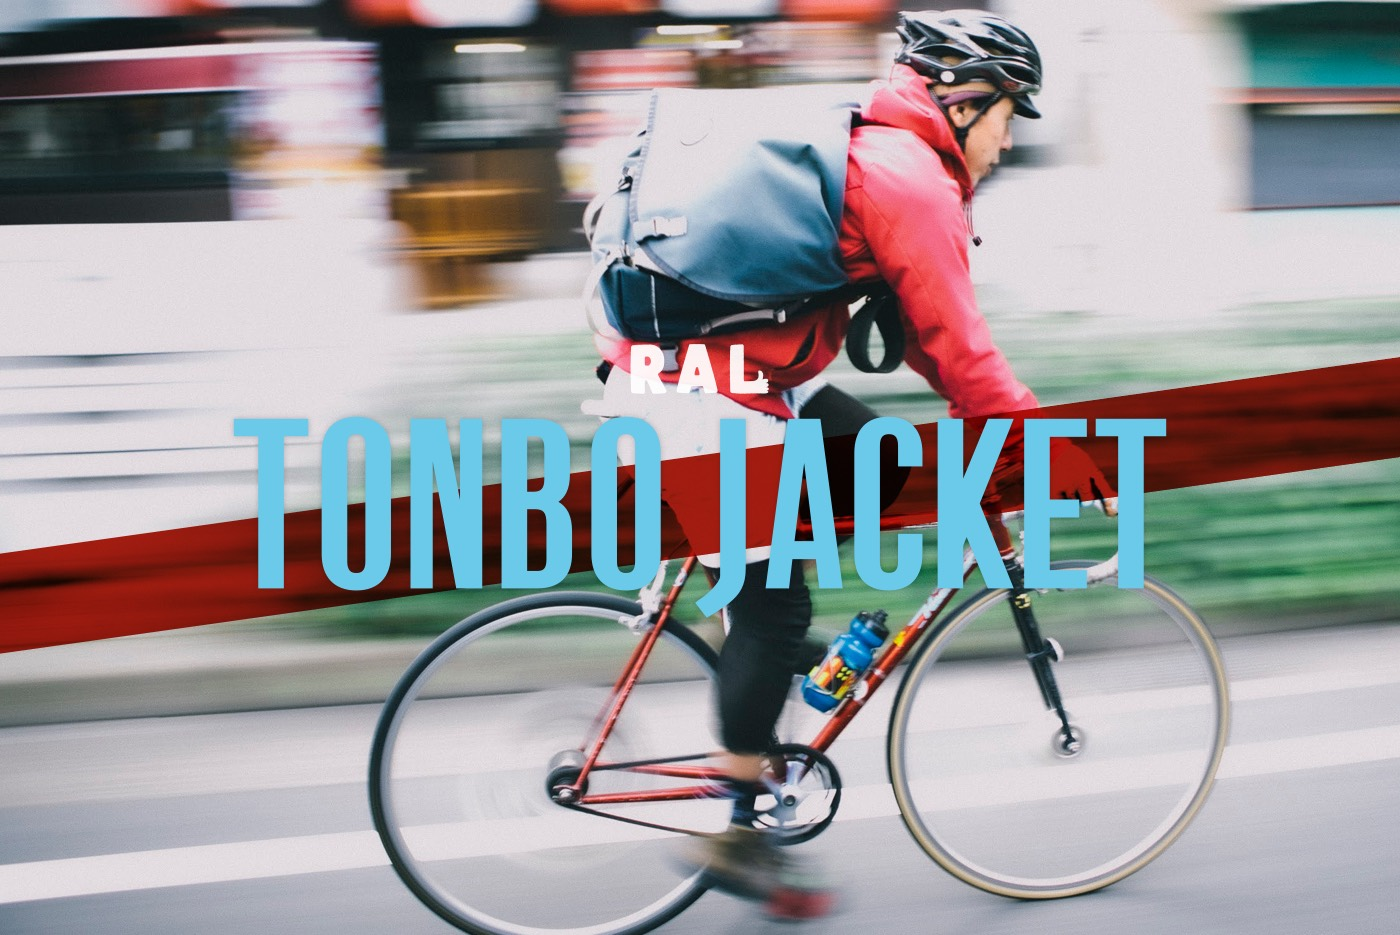 Tonbo Jacket